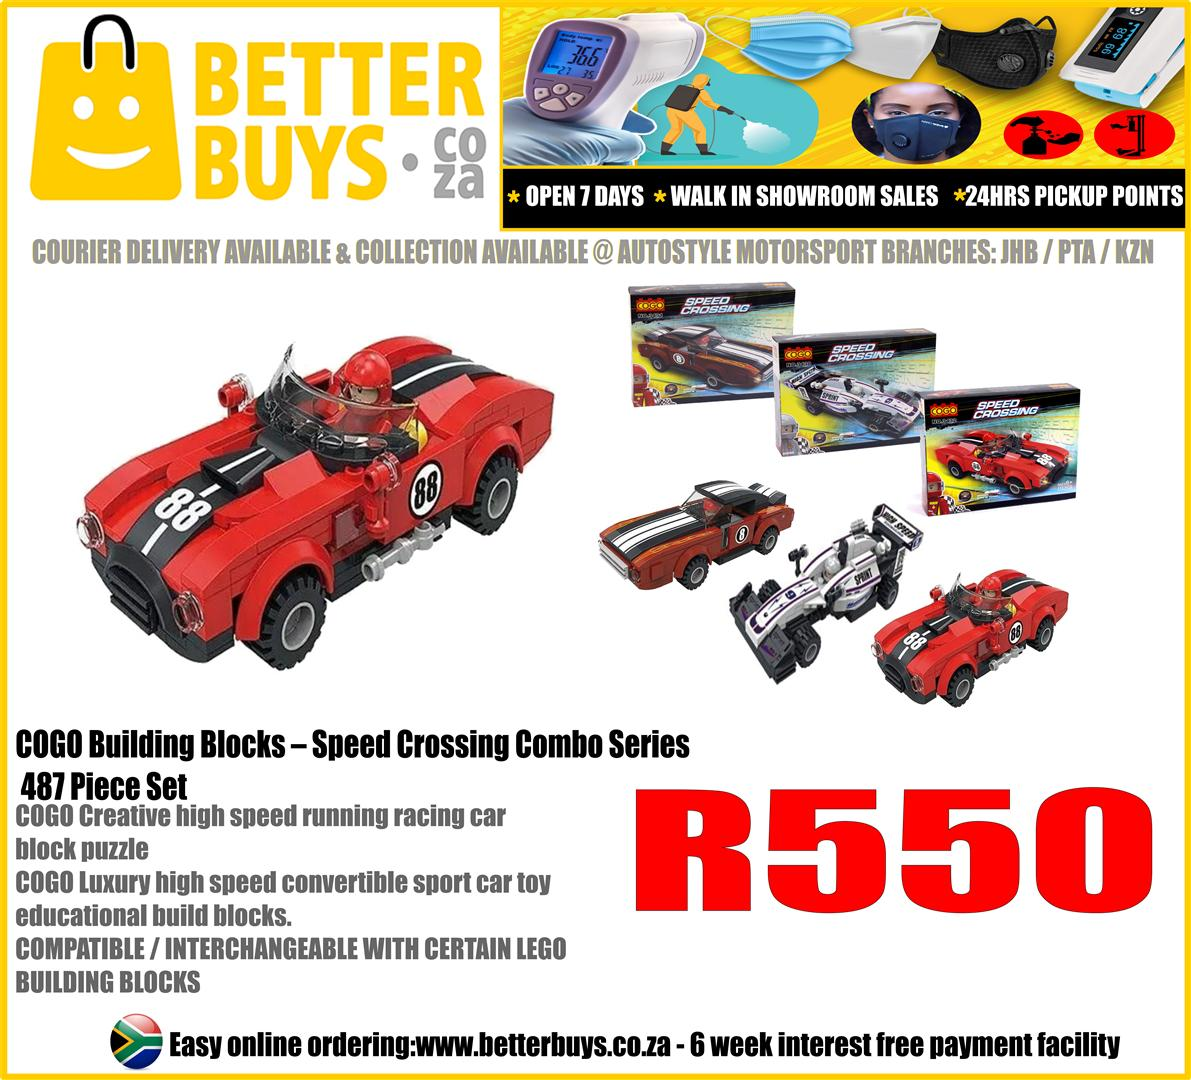 LEGO INSPIRED COGO Building Blocks – Speed Crossing Combo Series 487 Piece Set